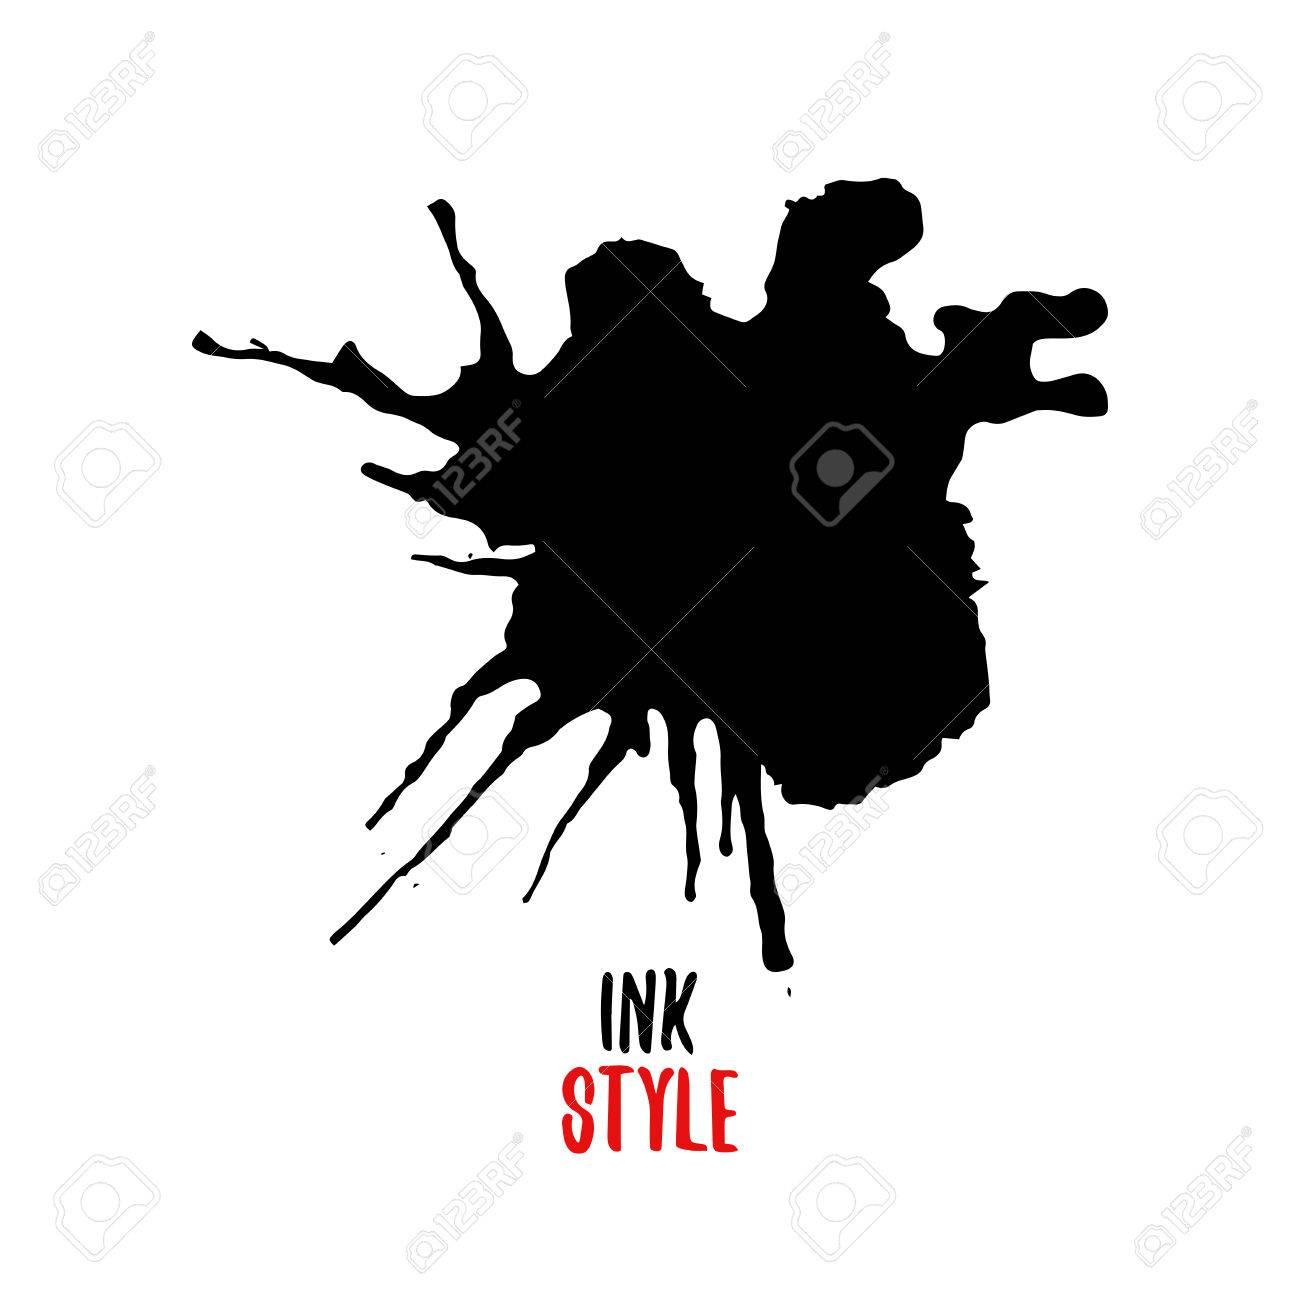 black blot or splash on white background in ink style vector rh 123rf com ink splatter vector free ink splatter vector free